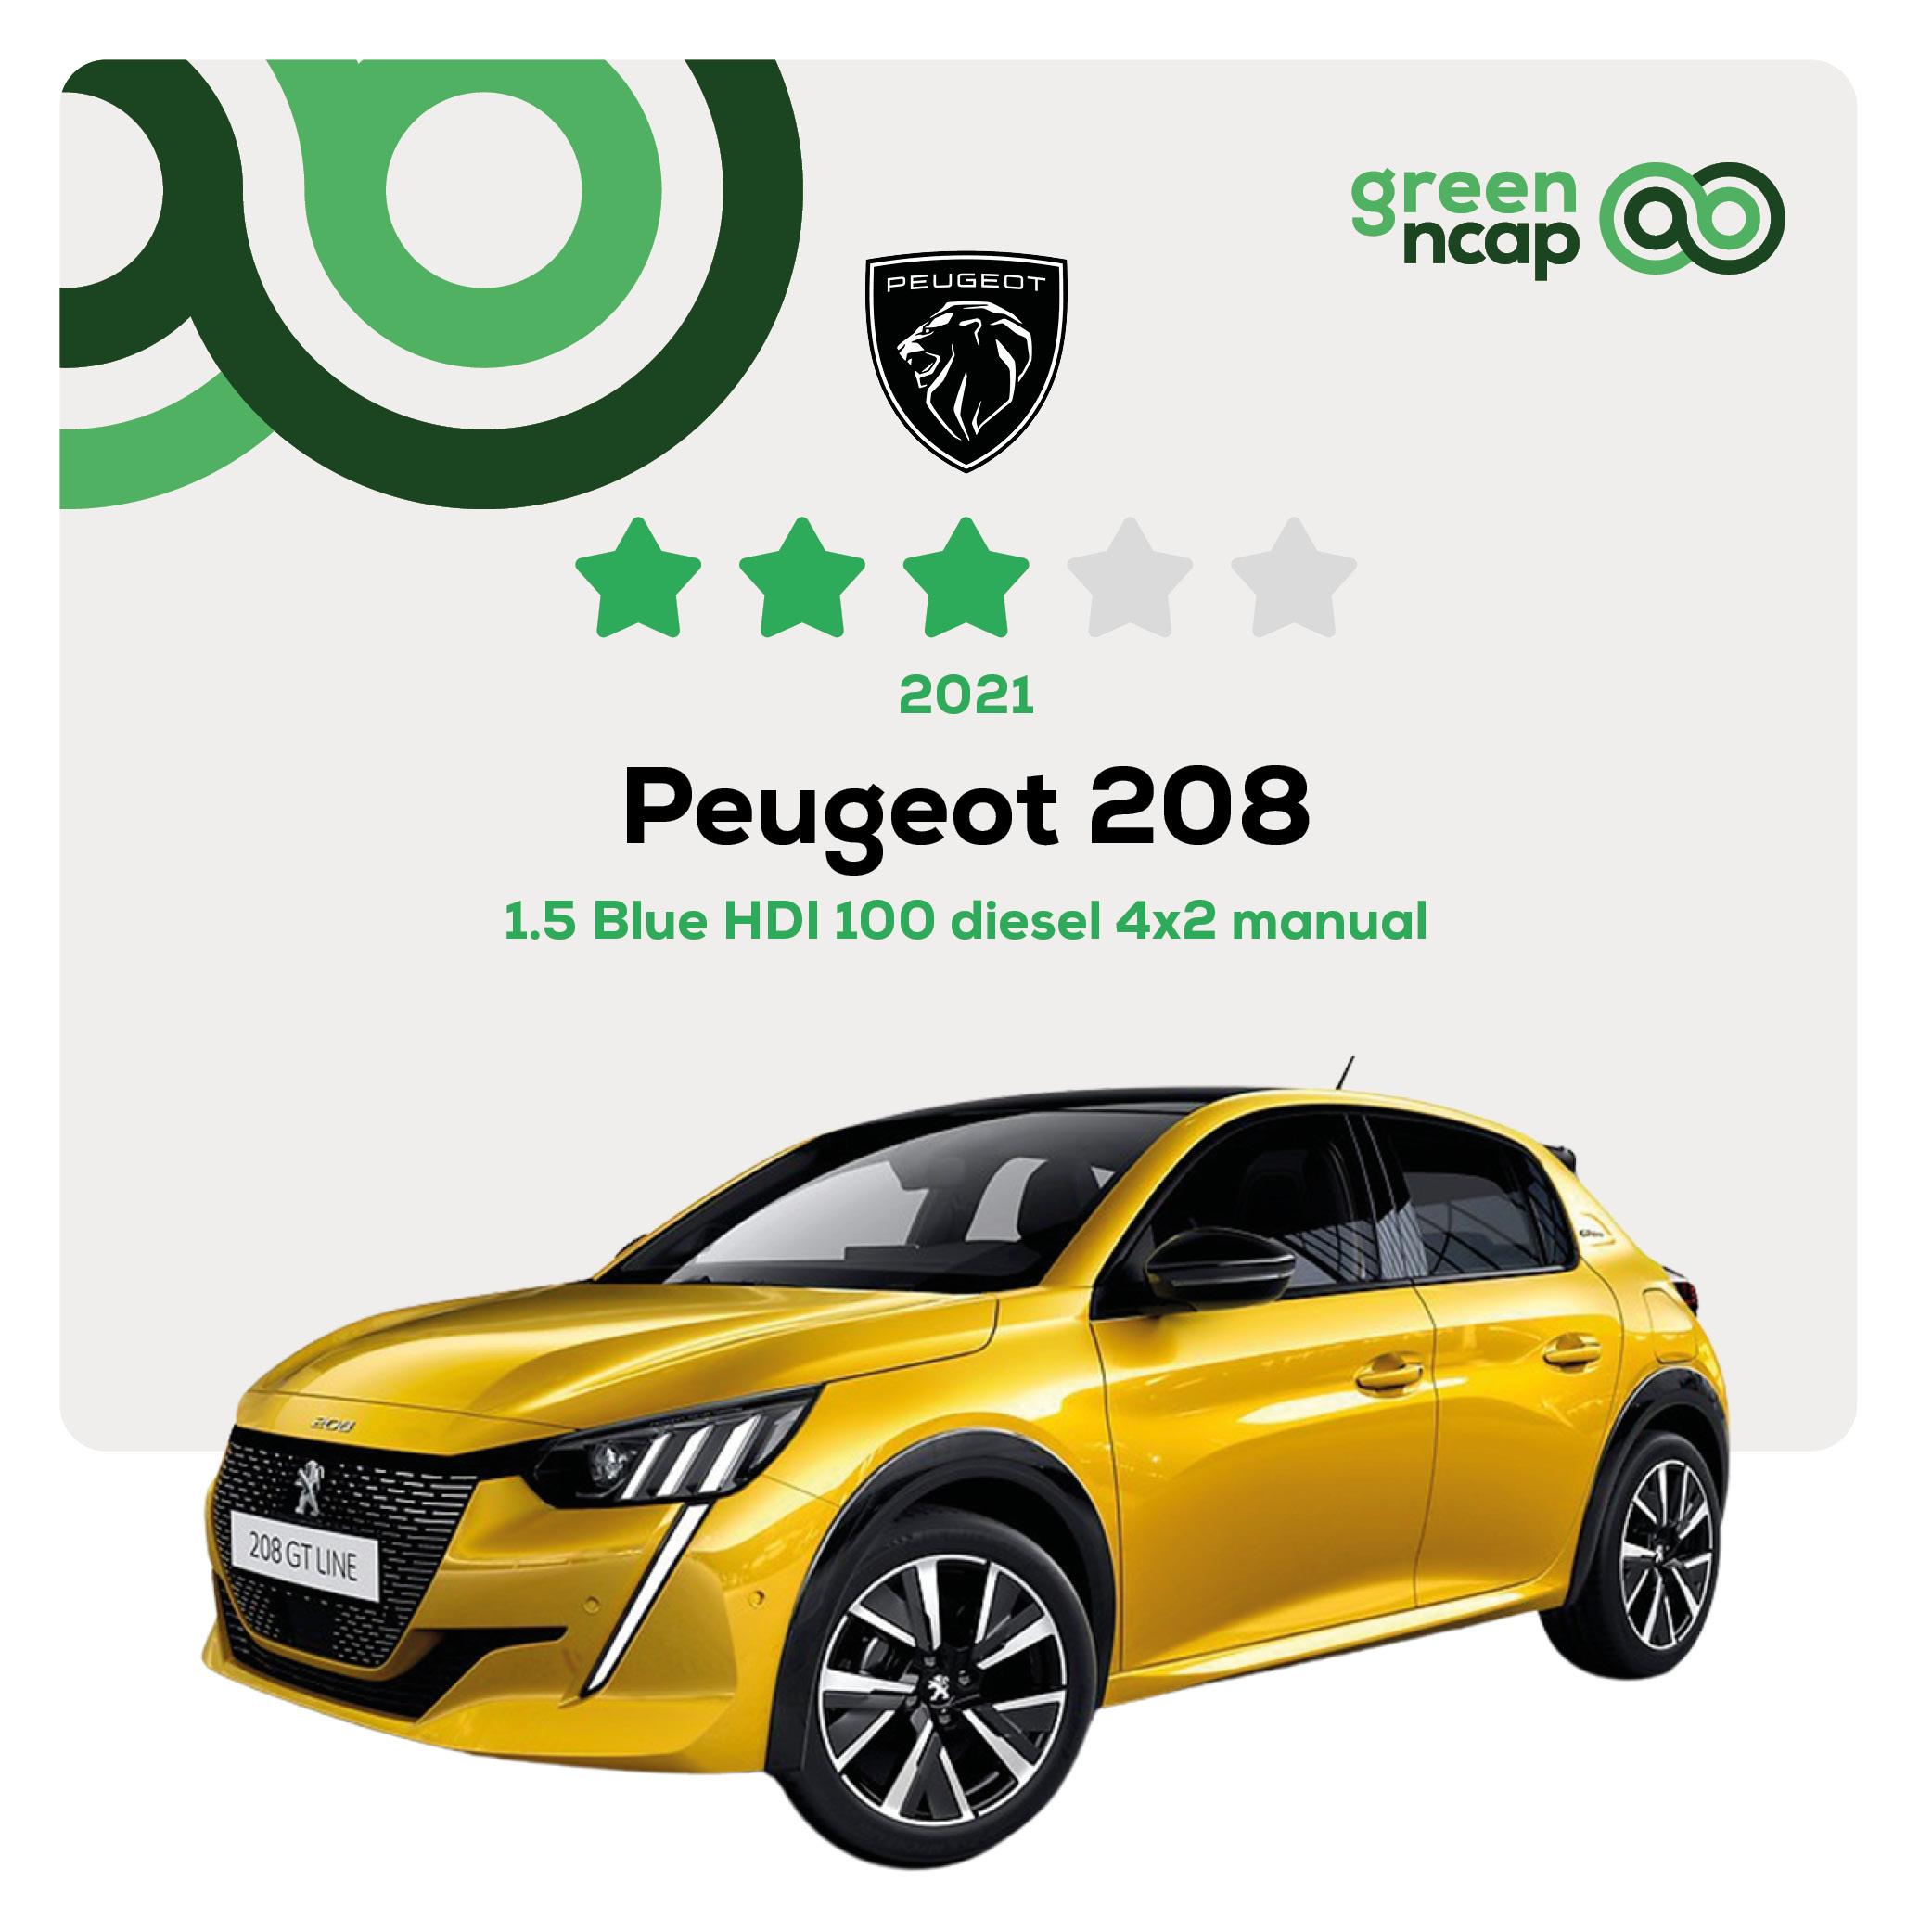 Peugeot 208 - Green NCAP Results July 2021 - 3 stars